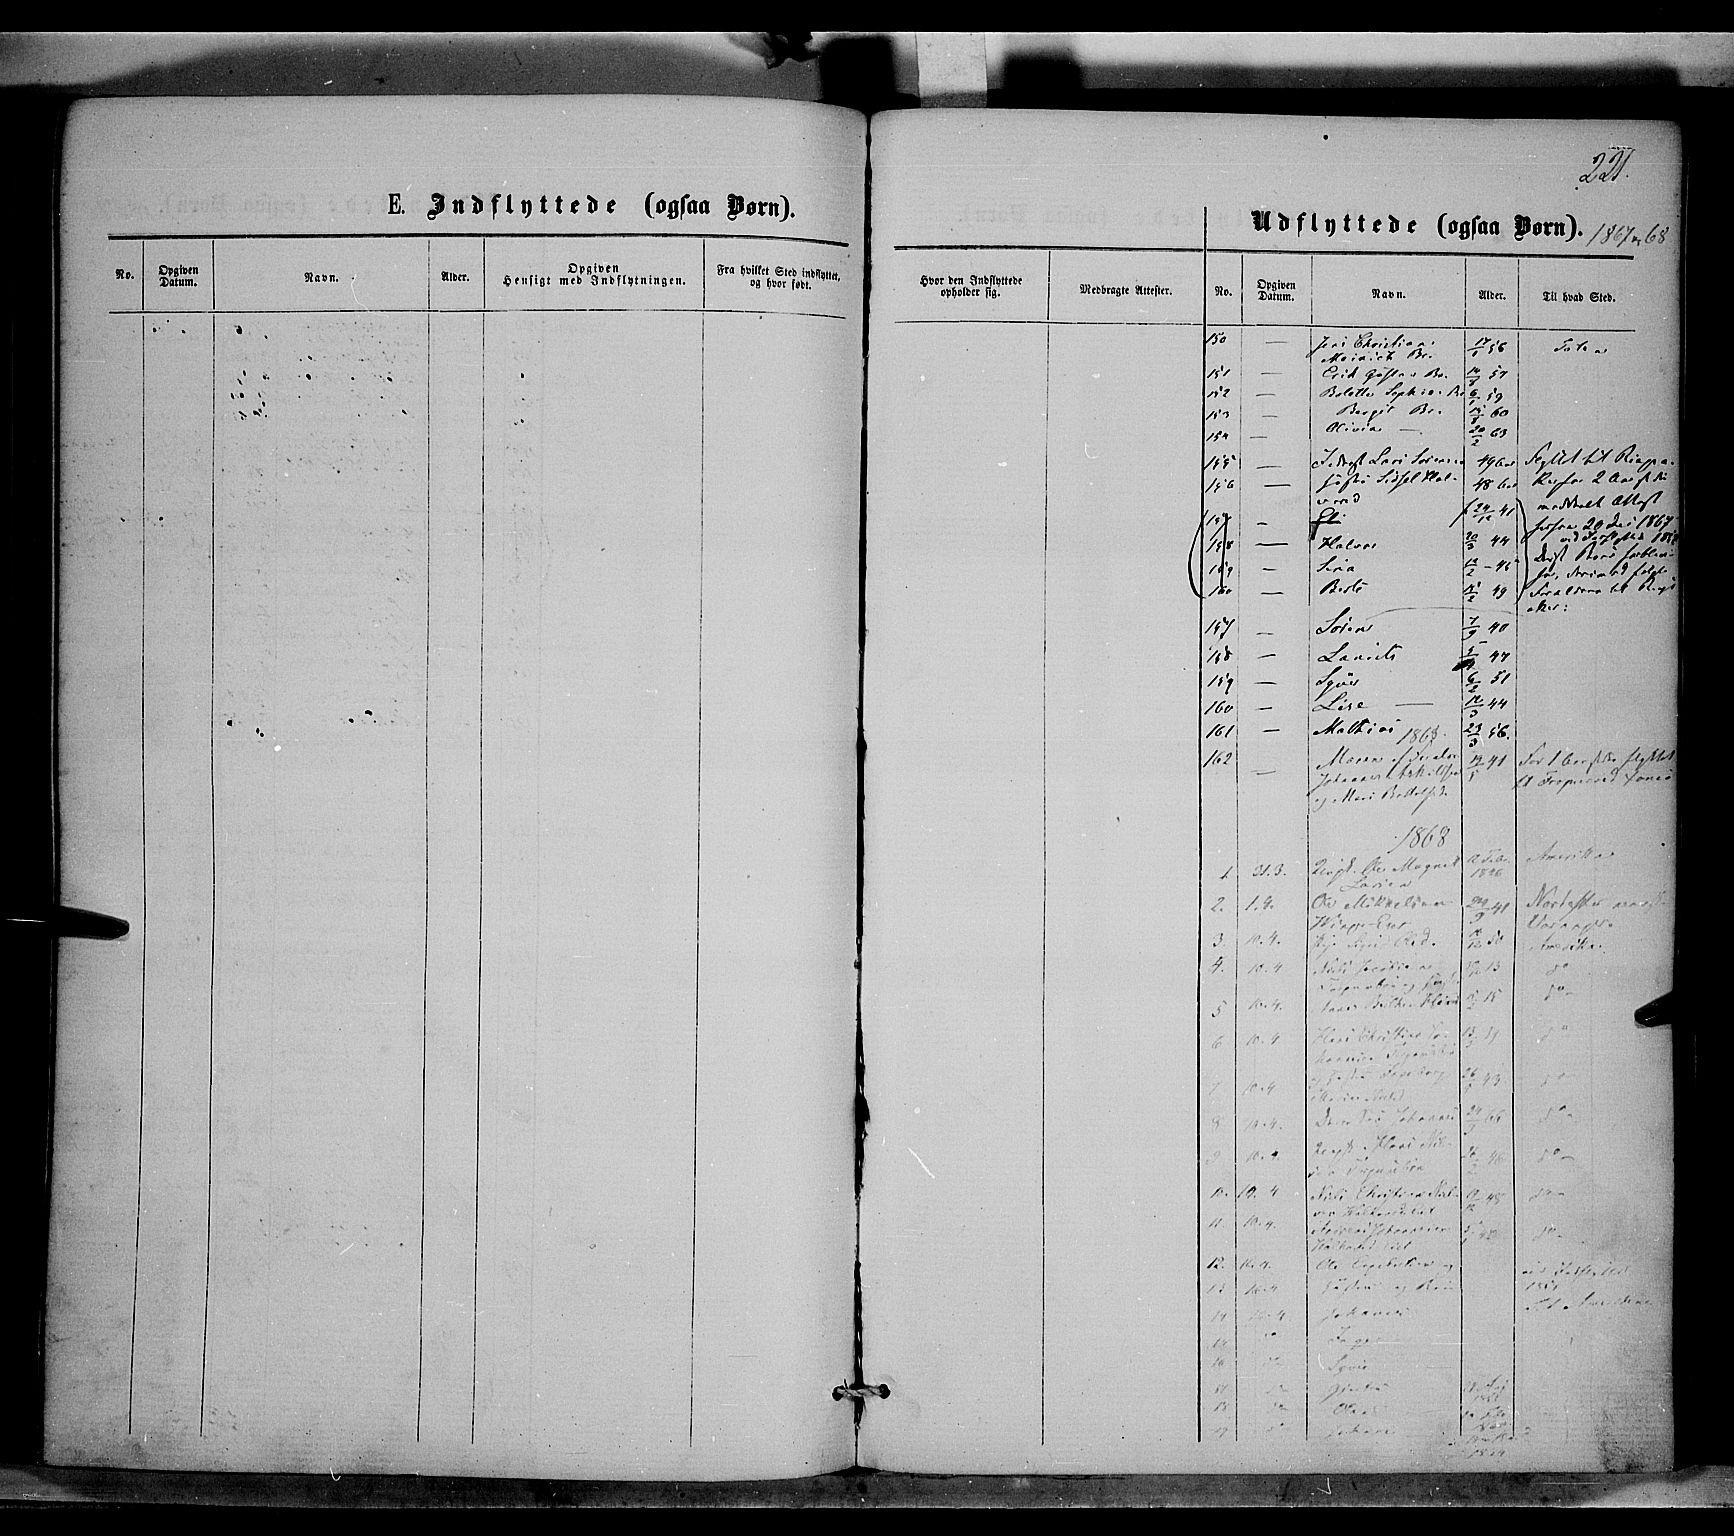 SAH, Nordre Land prestekontor, Ministerialbok nr. 1, 1860-1871, s. 221